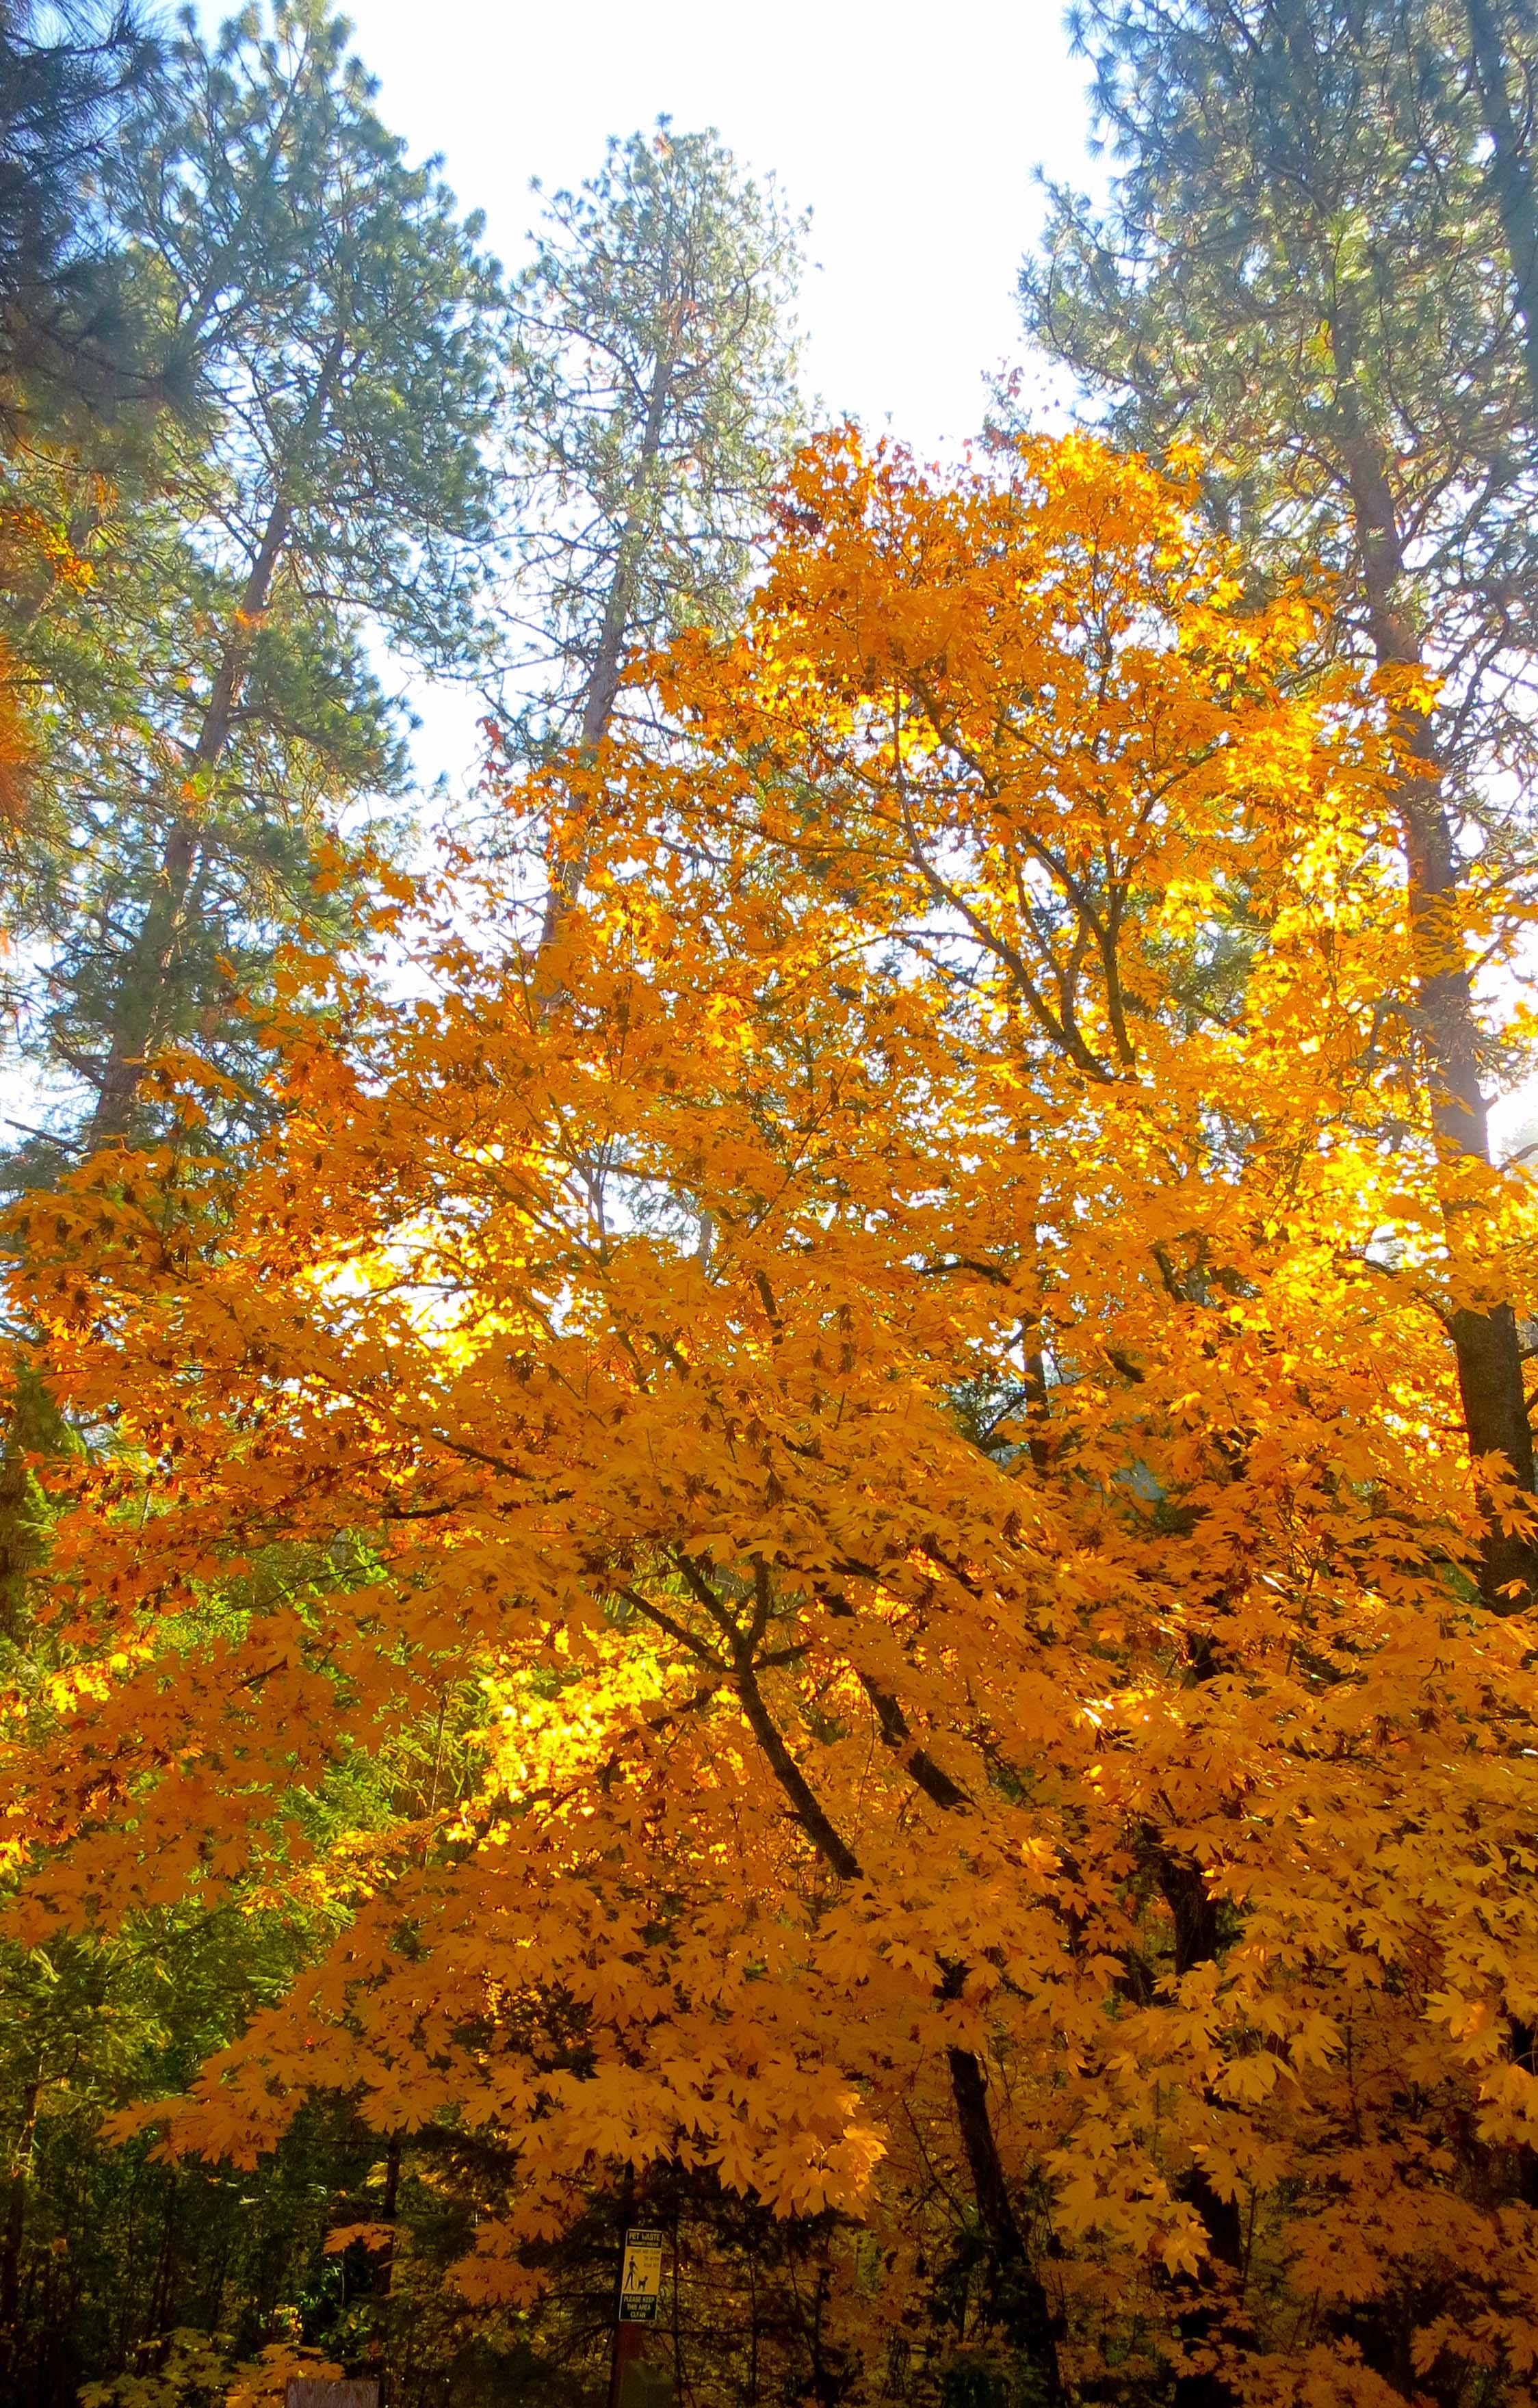 Oregon Maple photo by Curtis Mekemson.